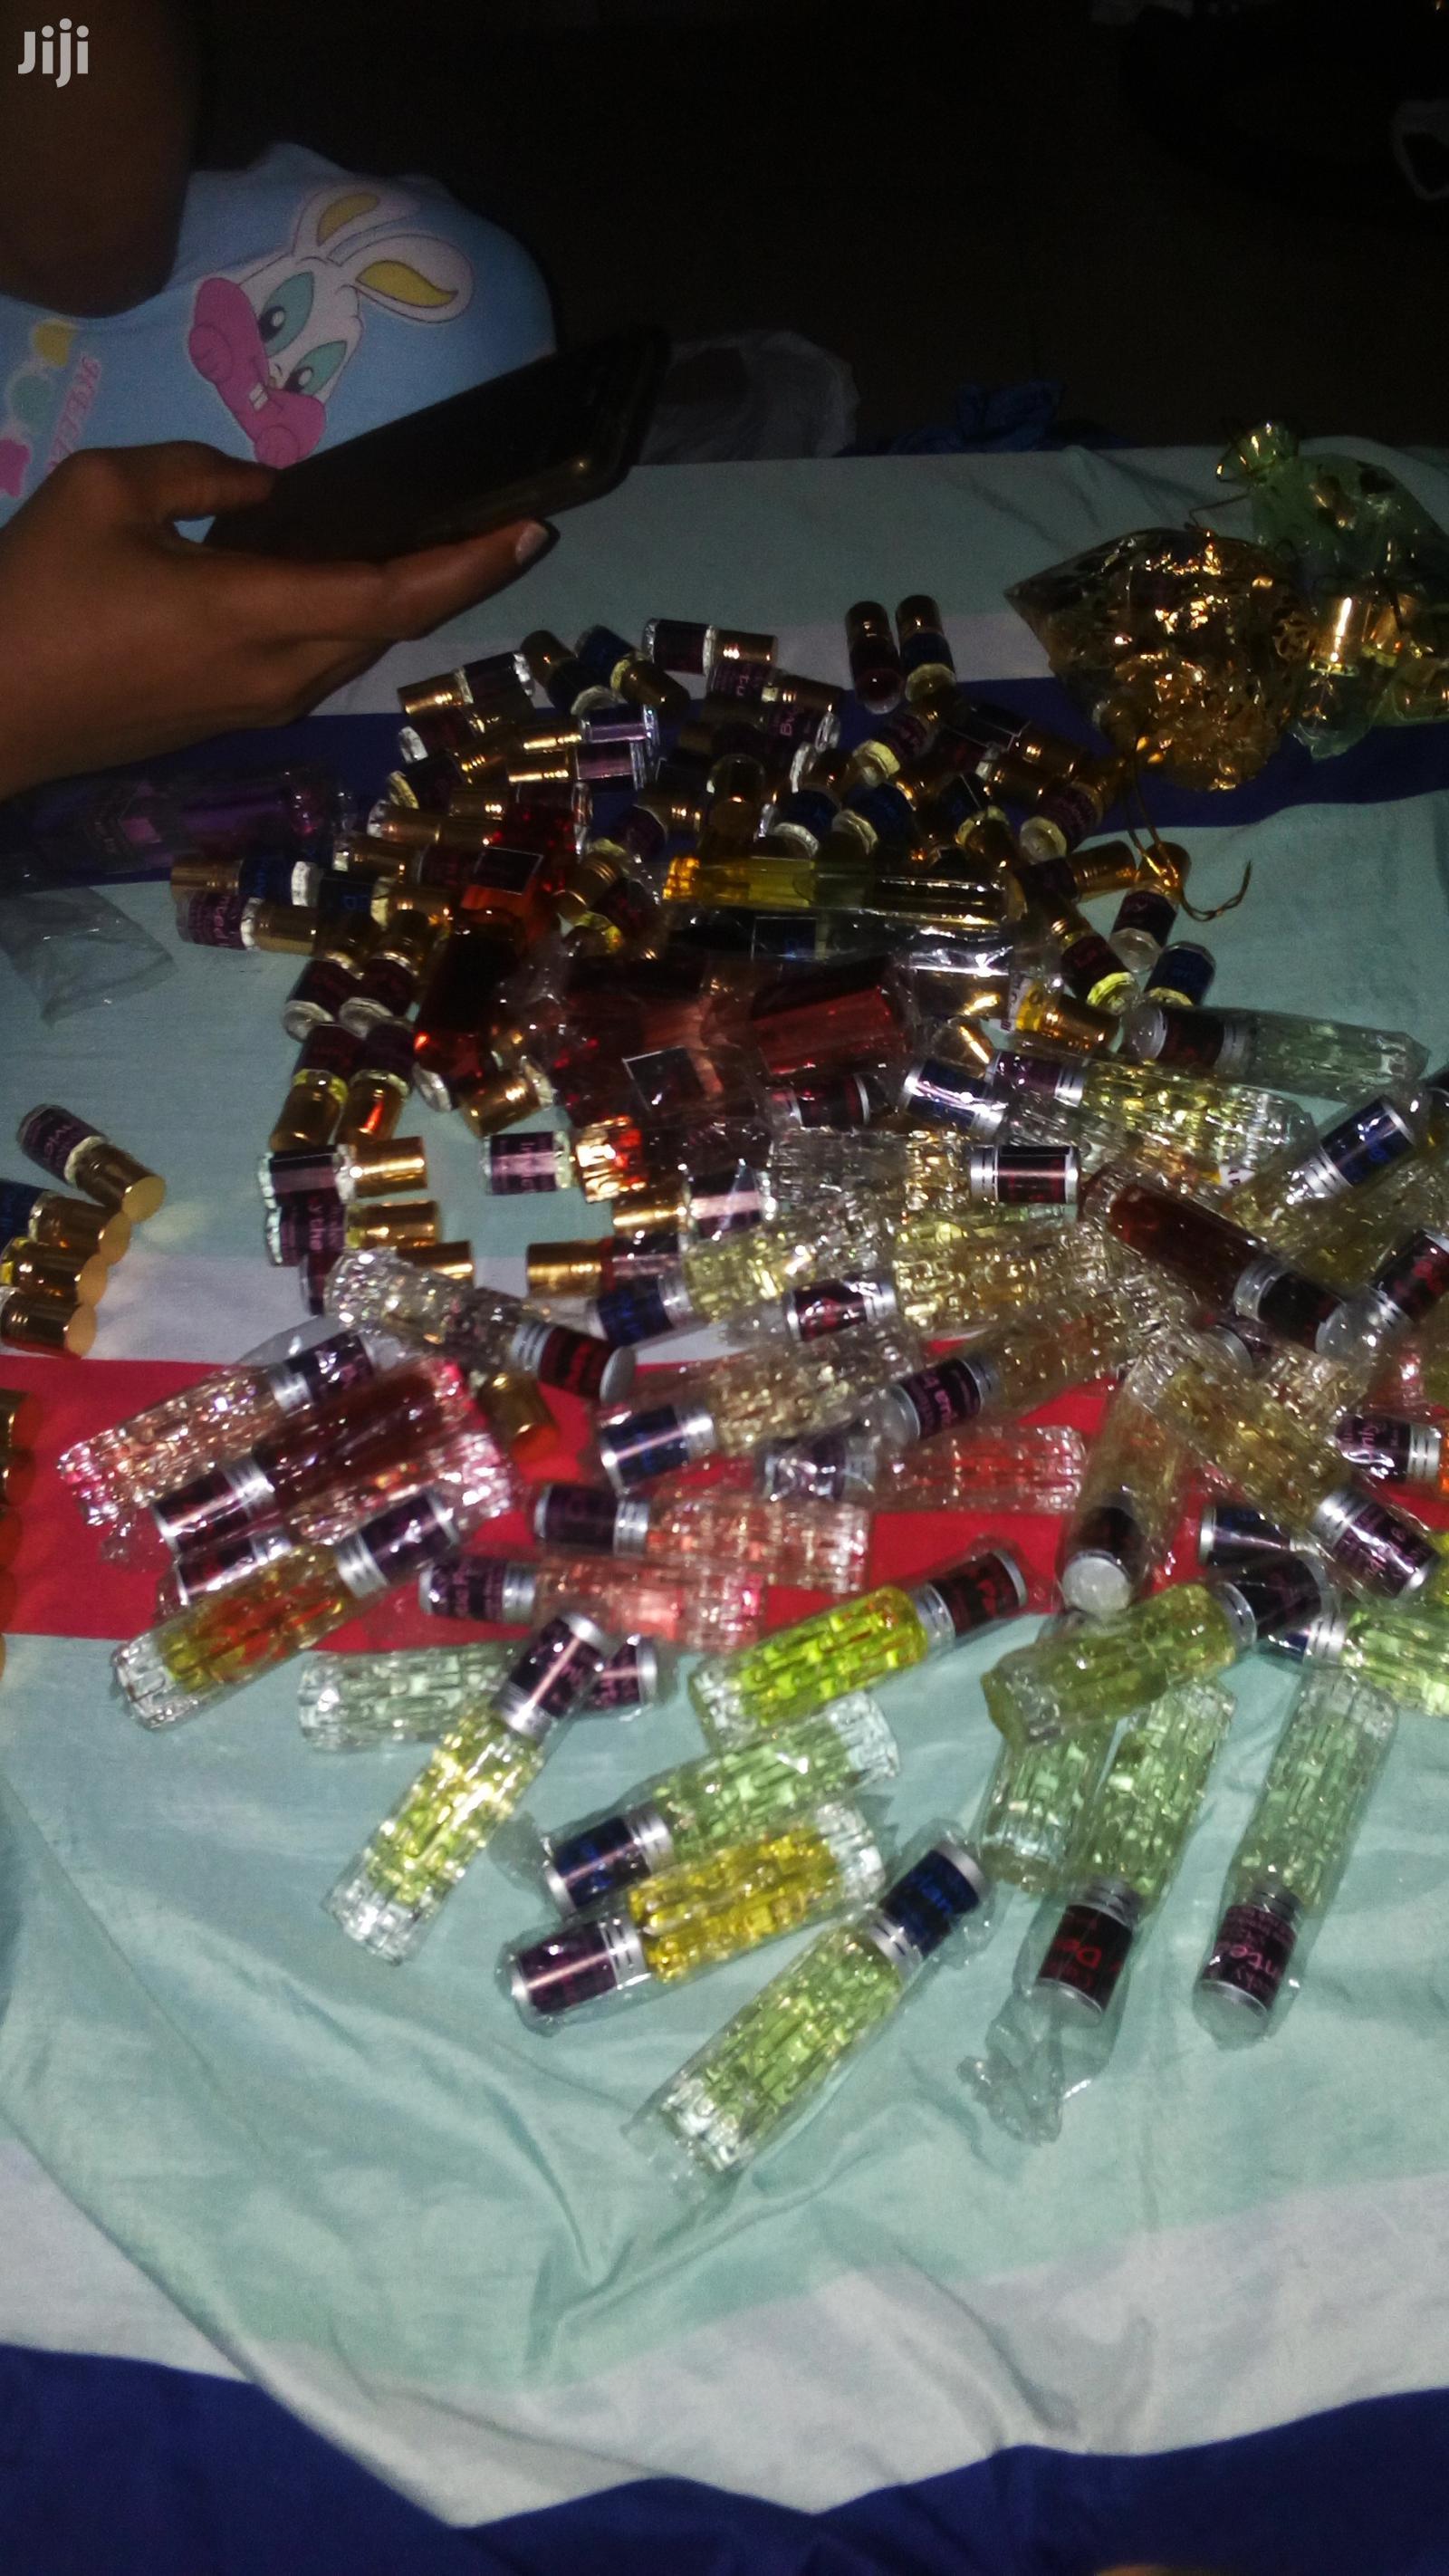 Fragrance Unisex Oil 3 ml   Fragrance for sale in Obio-Akpor, Rivers State, Nigeria